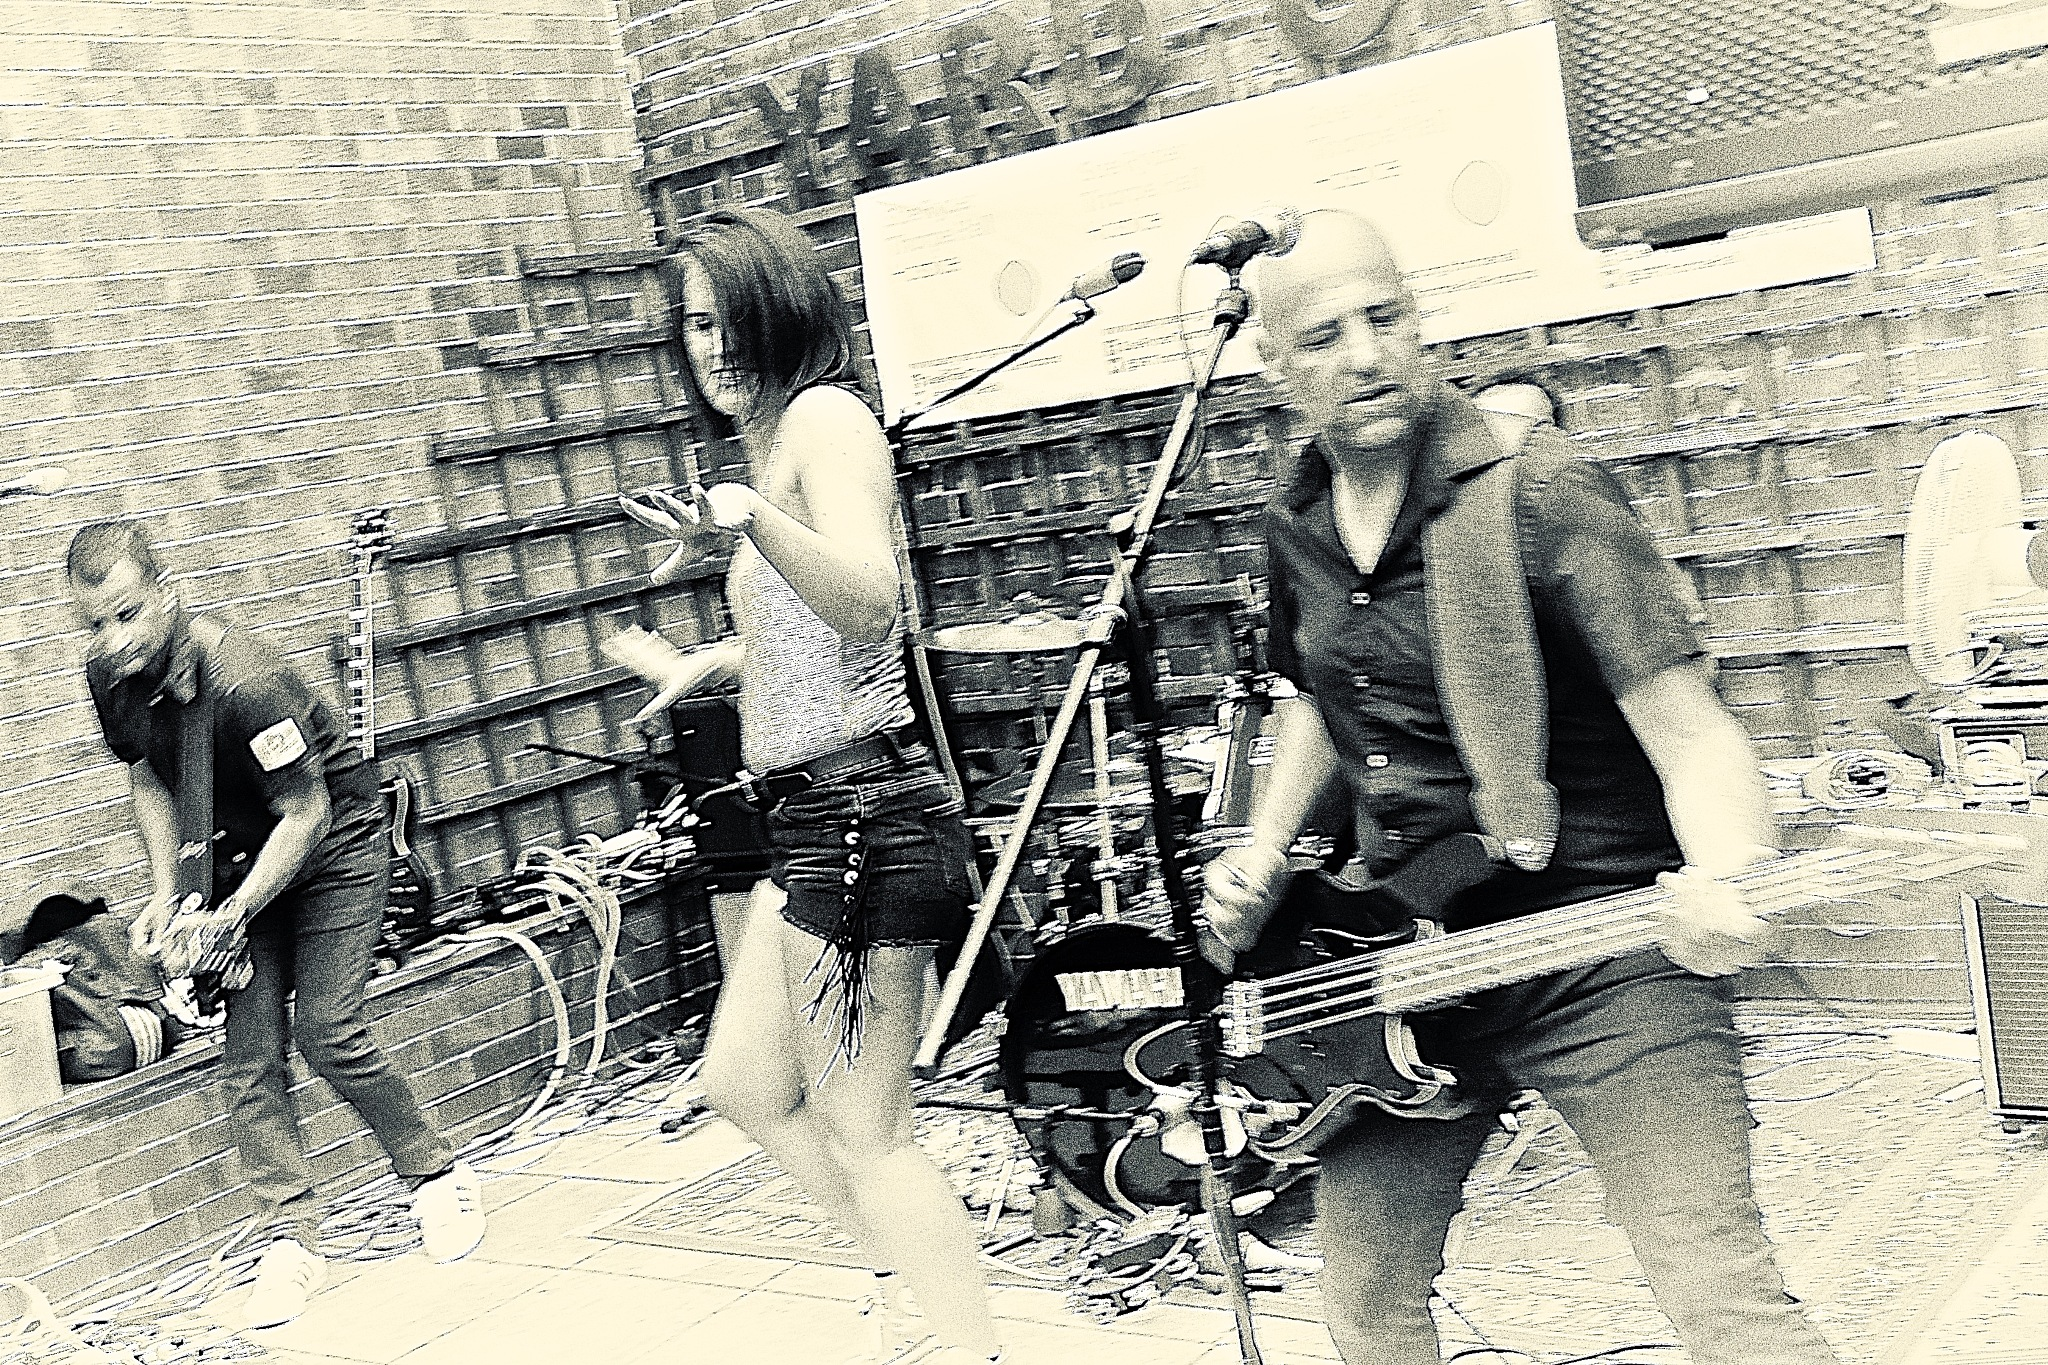 Punk rocking by Tony Otley